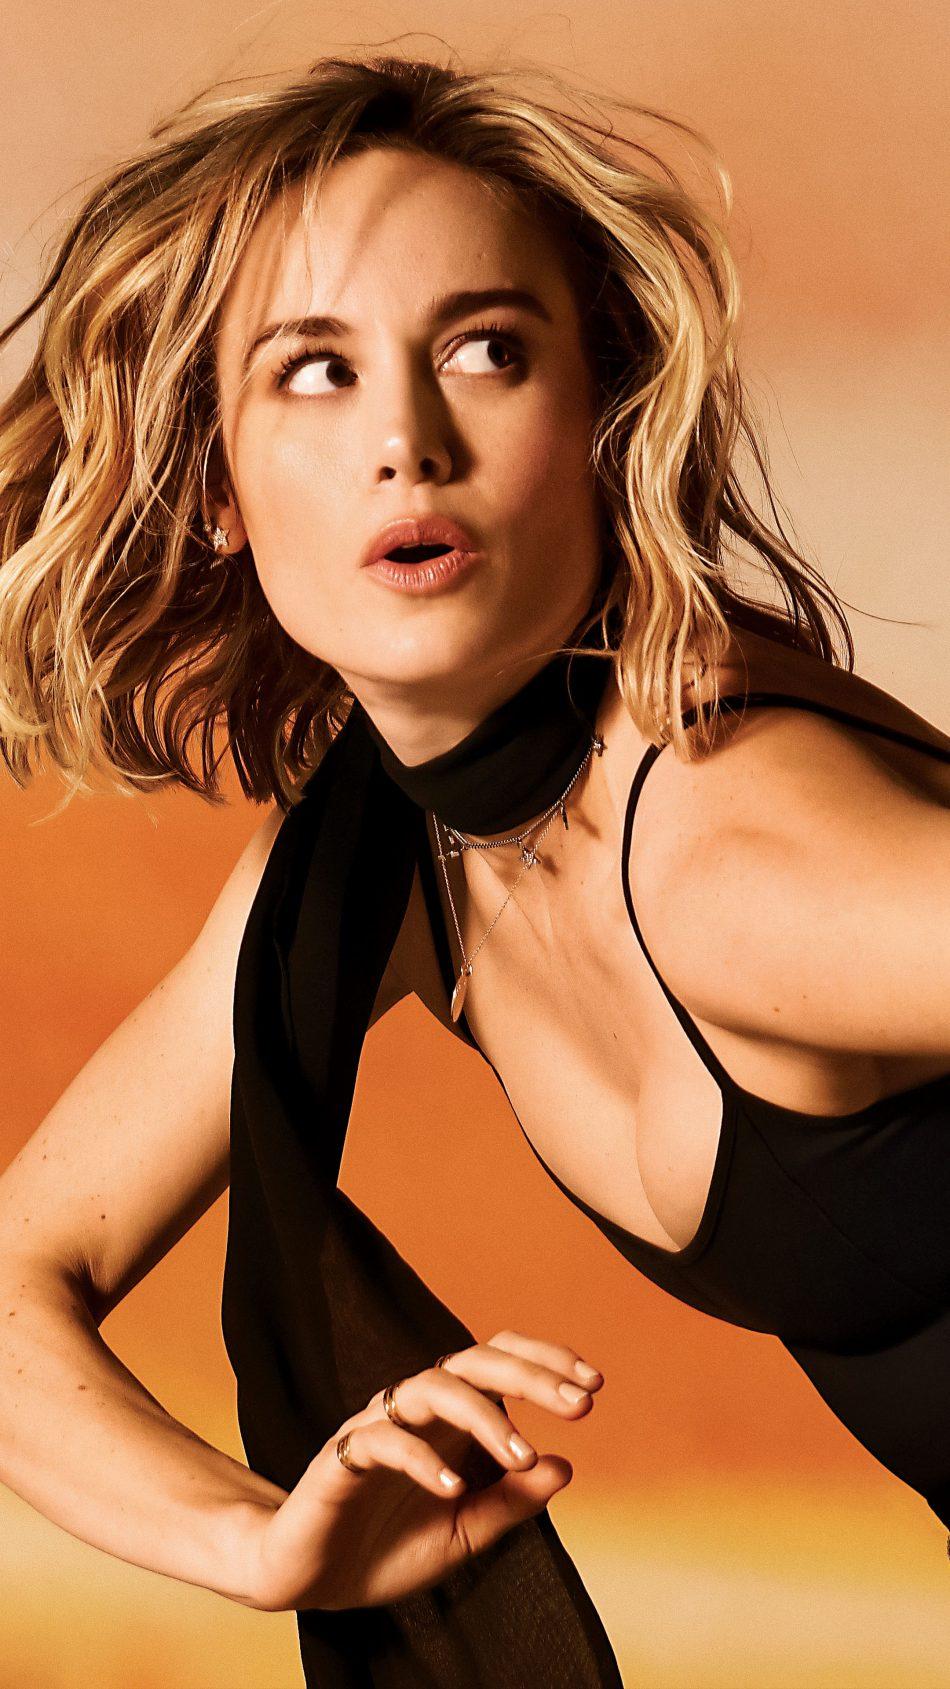 Brie Larson 2019 4K Ultra HD Mobile Wallpaper